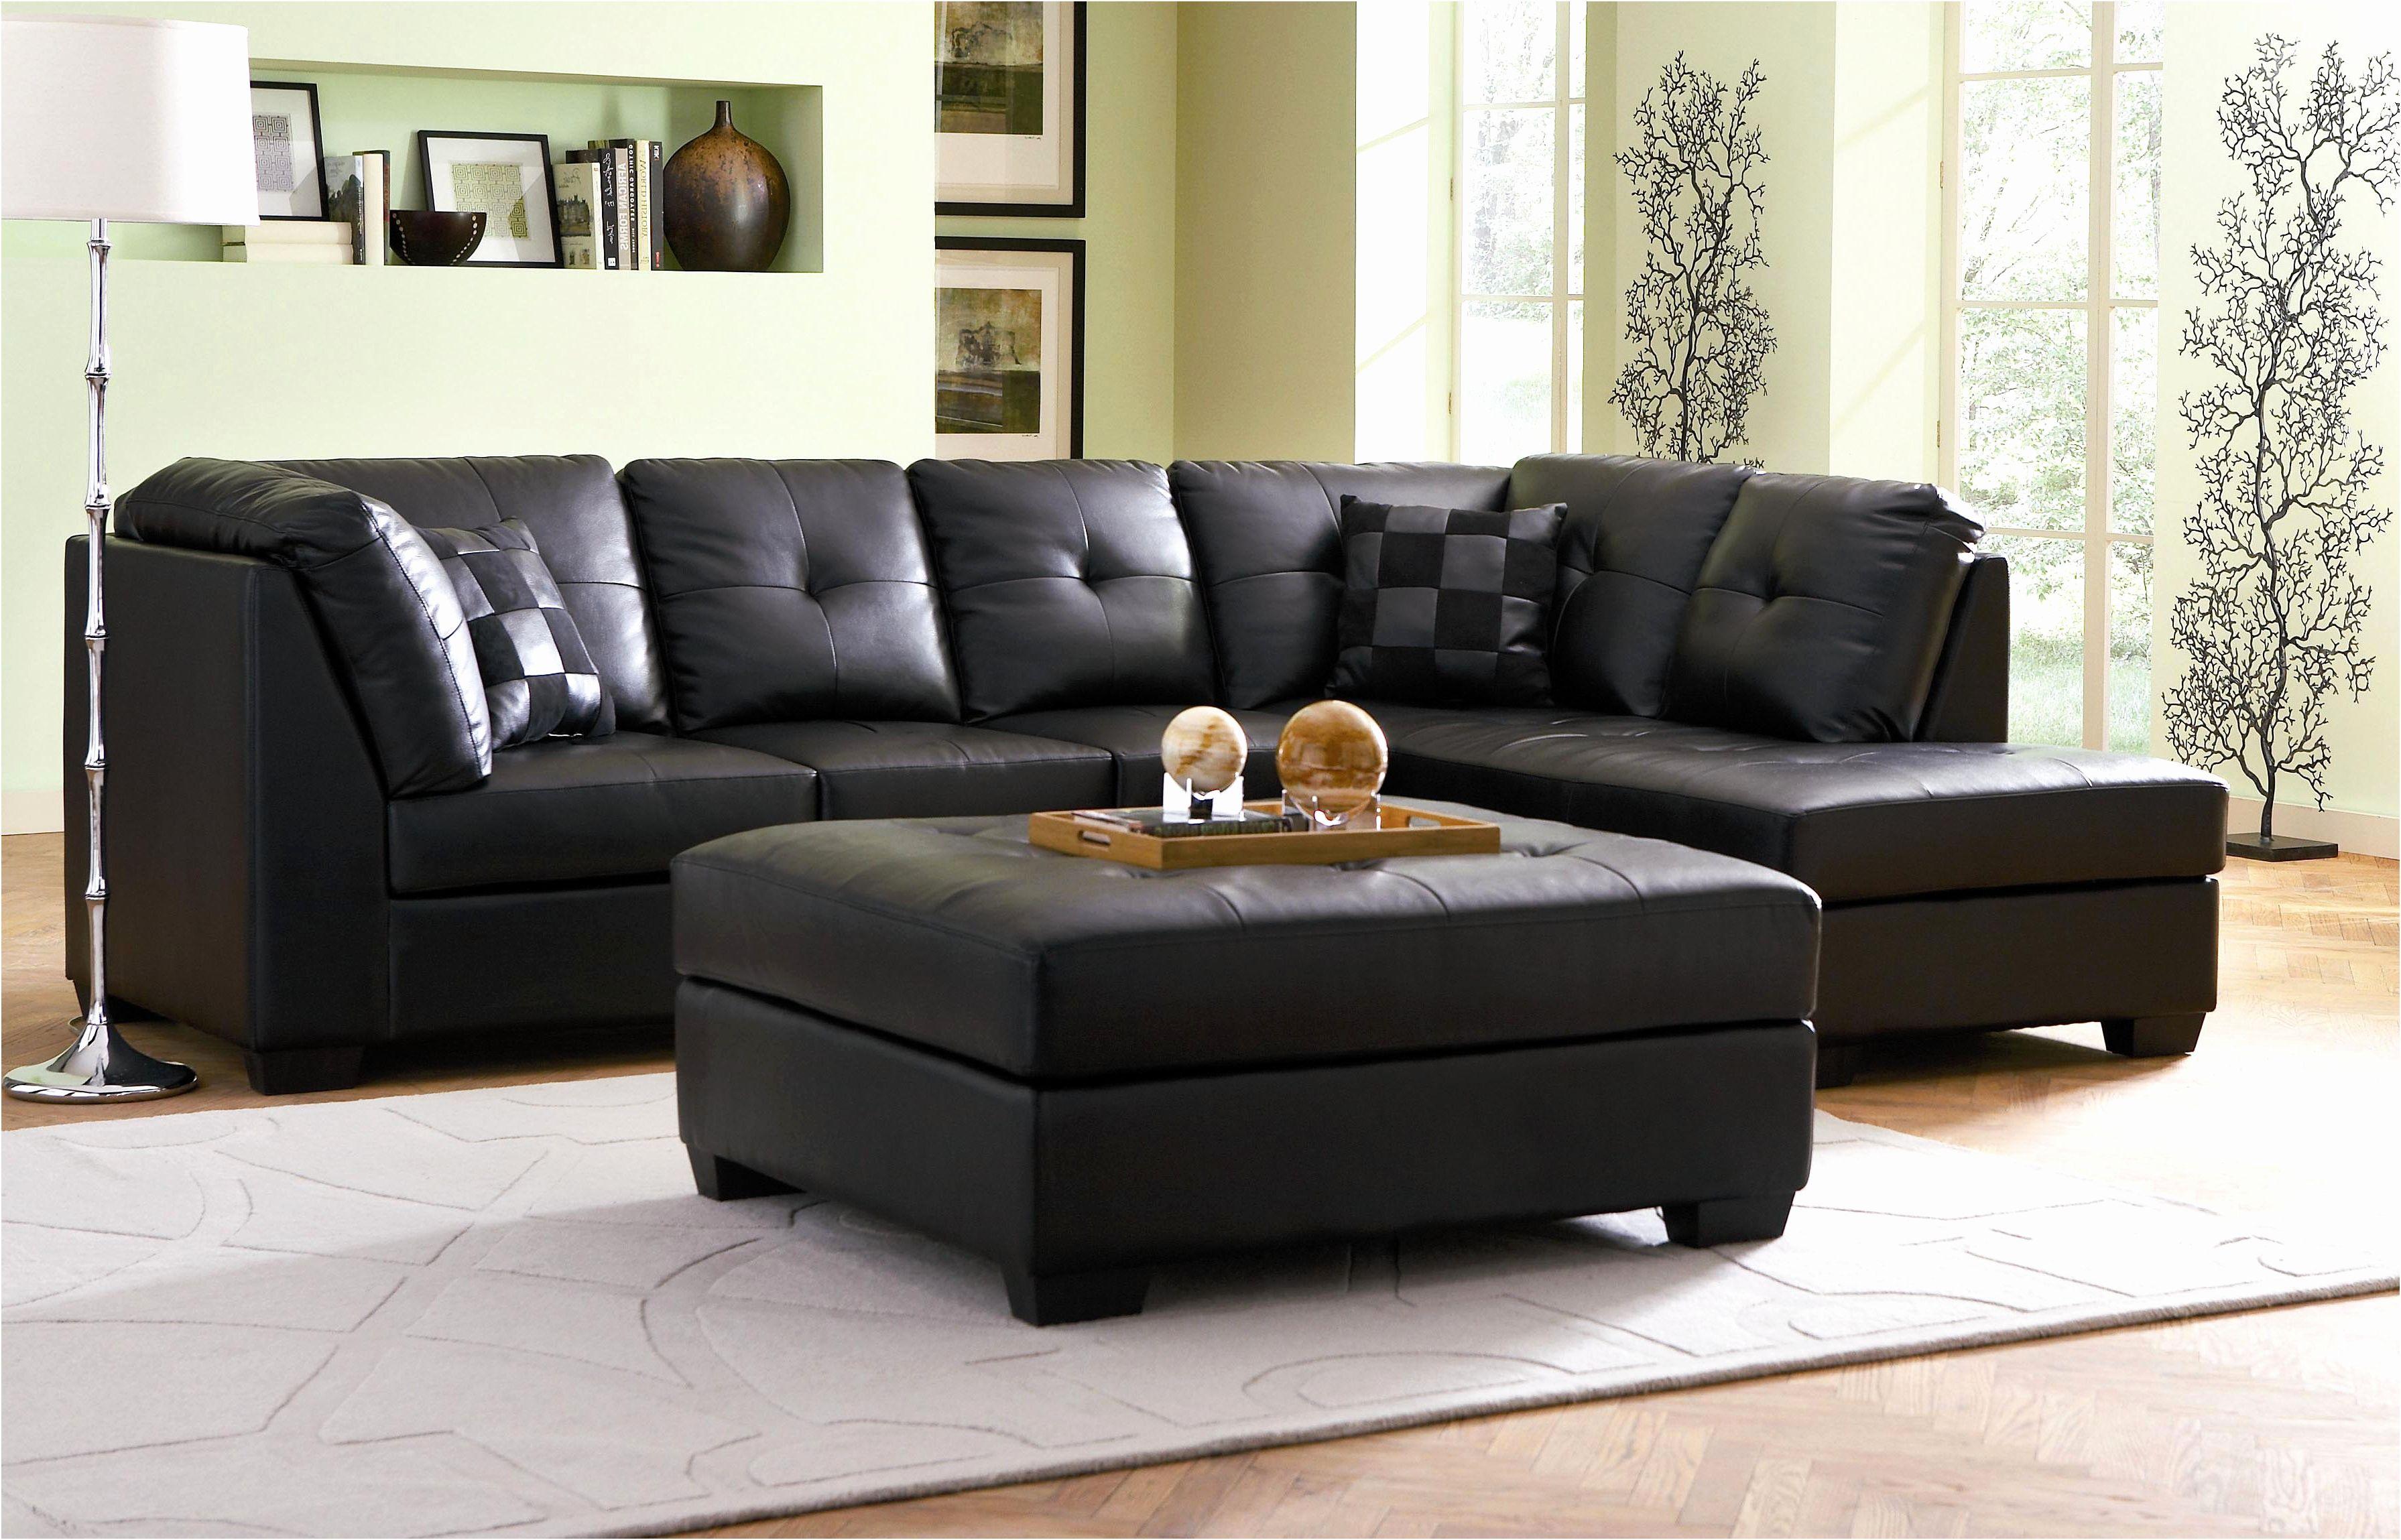 Idea Bedroom Sofa Set Pics 53 Amazing Sofa Set With Couch Image